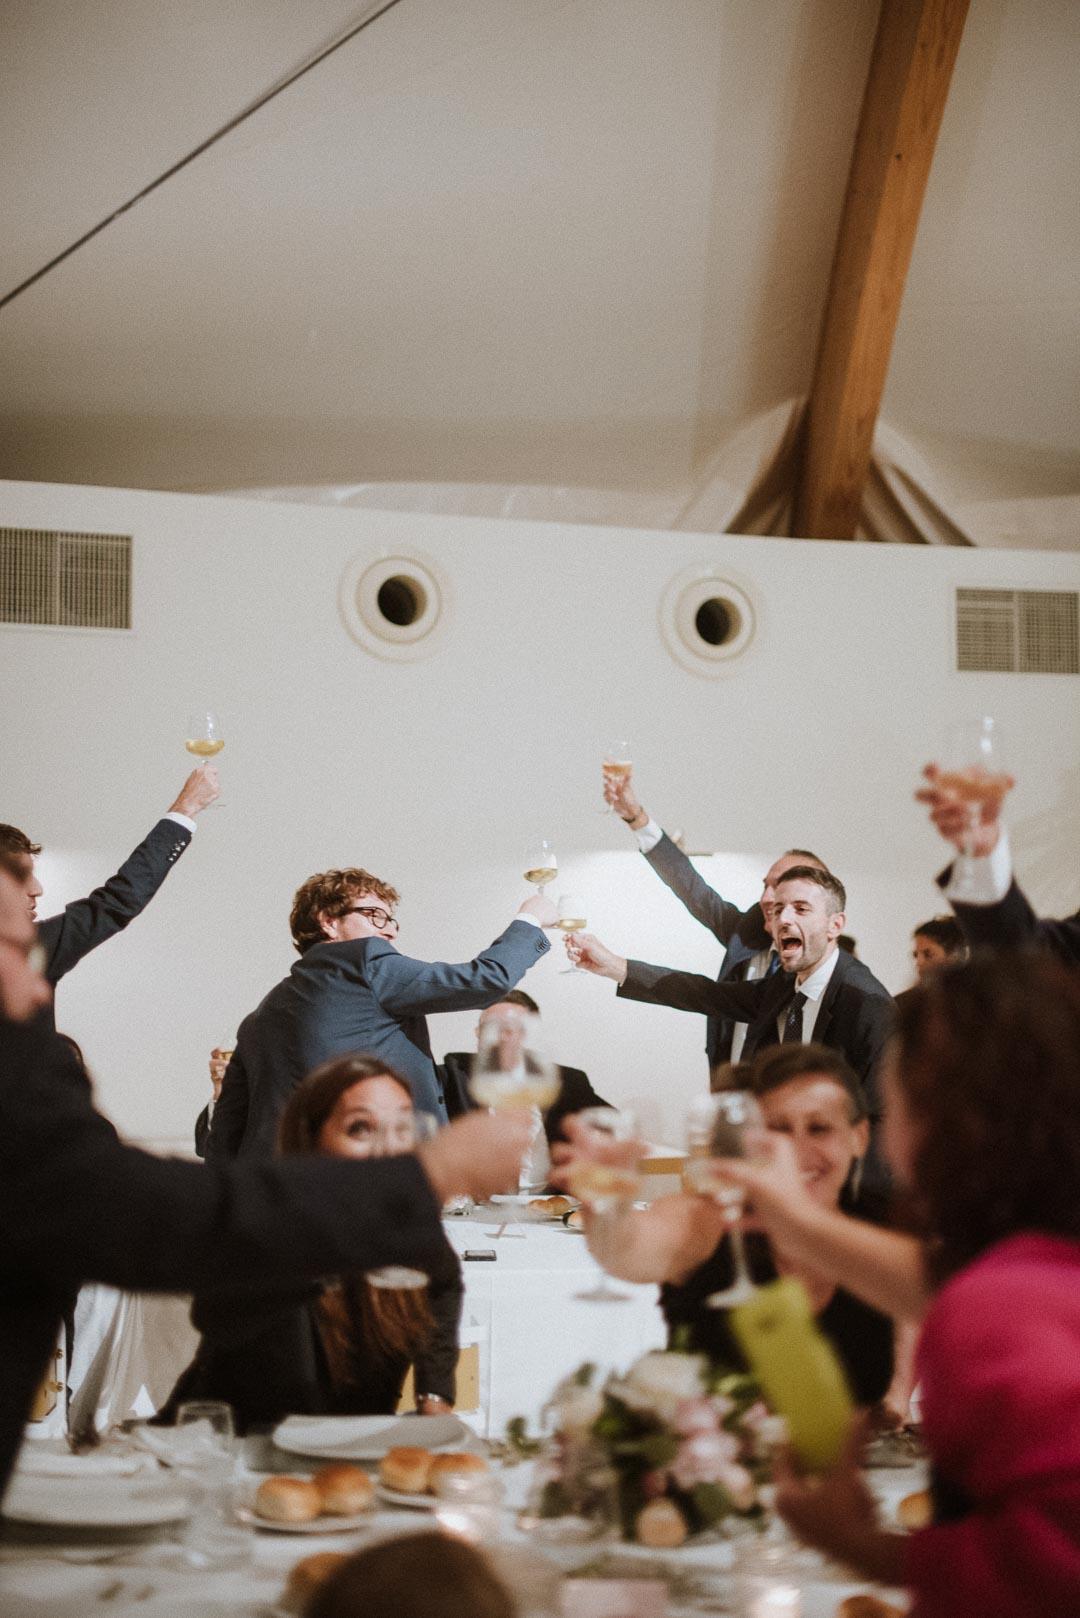 wedding-photographer-destination-fineart-bespoke-reportage-napoli-nabilah-vivianeizzo-spazio46-180